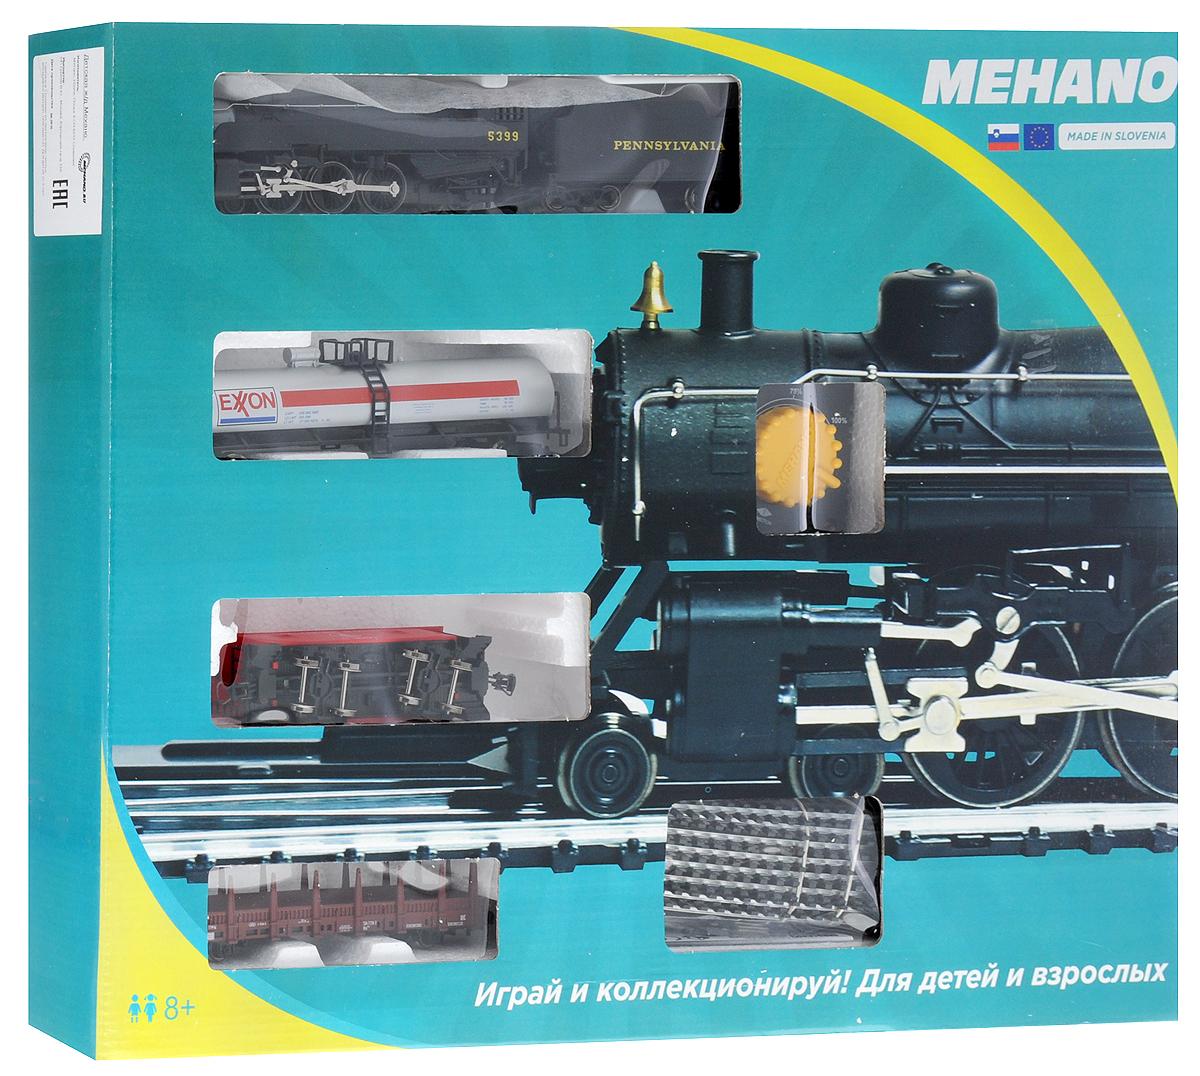 Mehano Железная дорога Prestige с паровозом Pennsylvania 5399